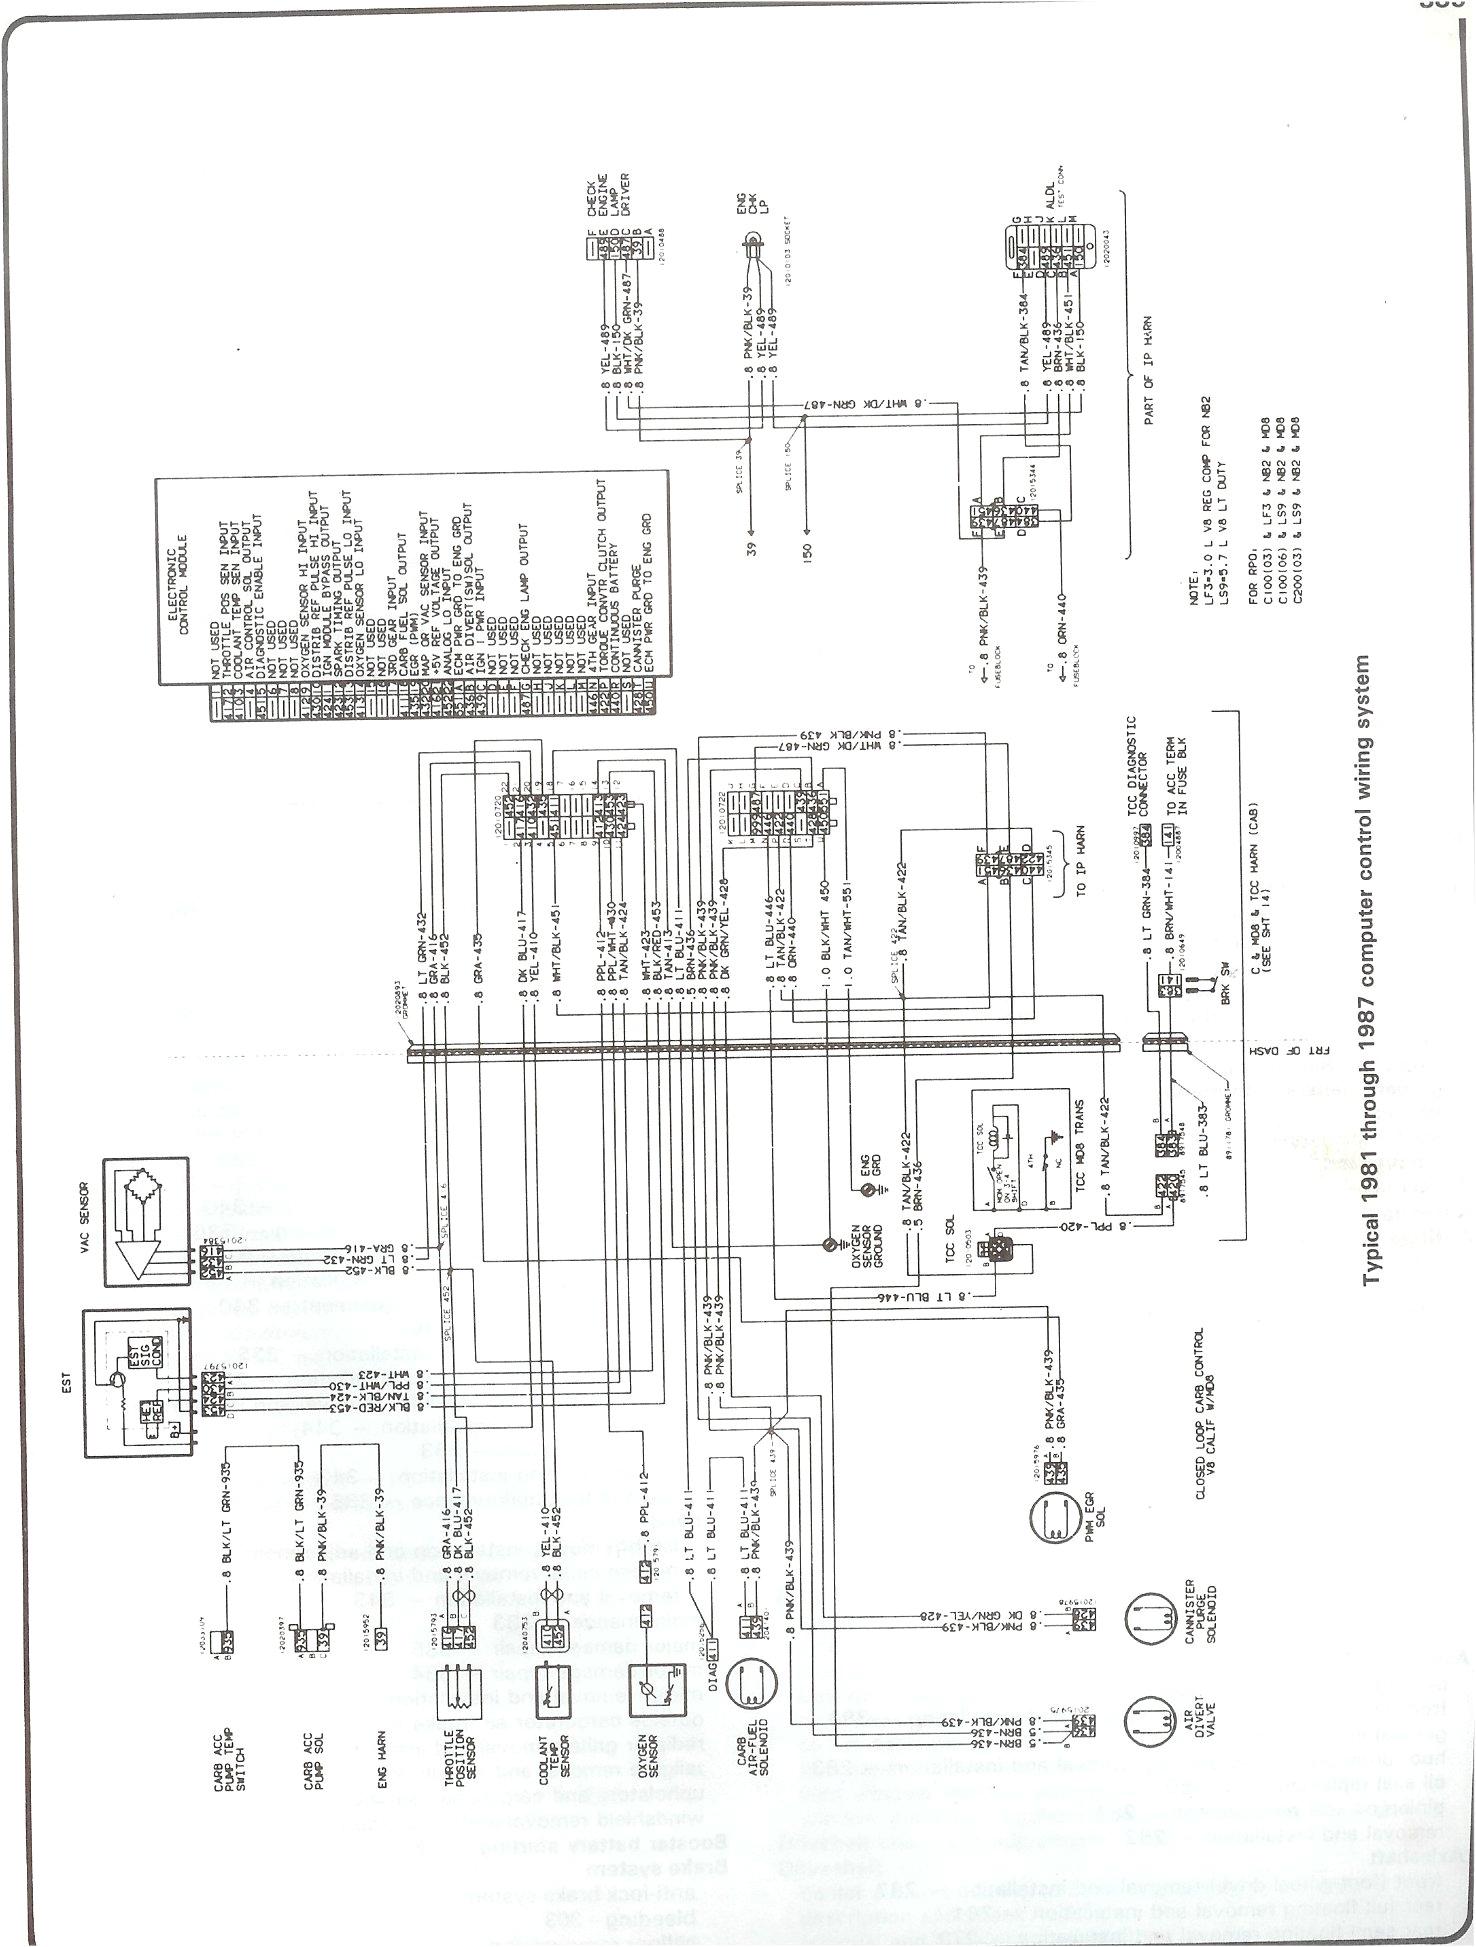 81 87 computer control wiring jpg